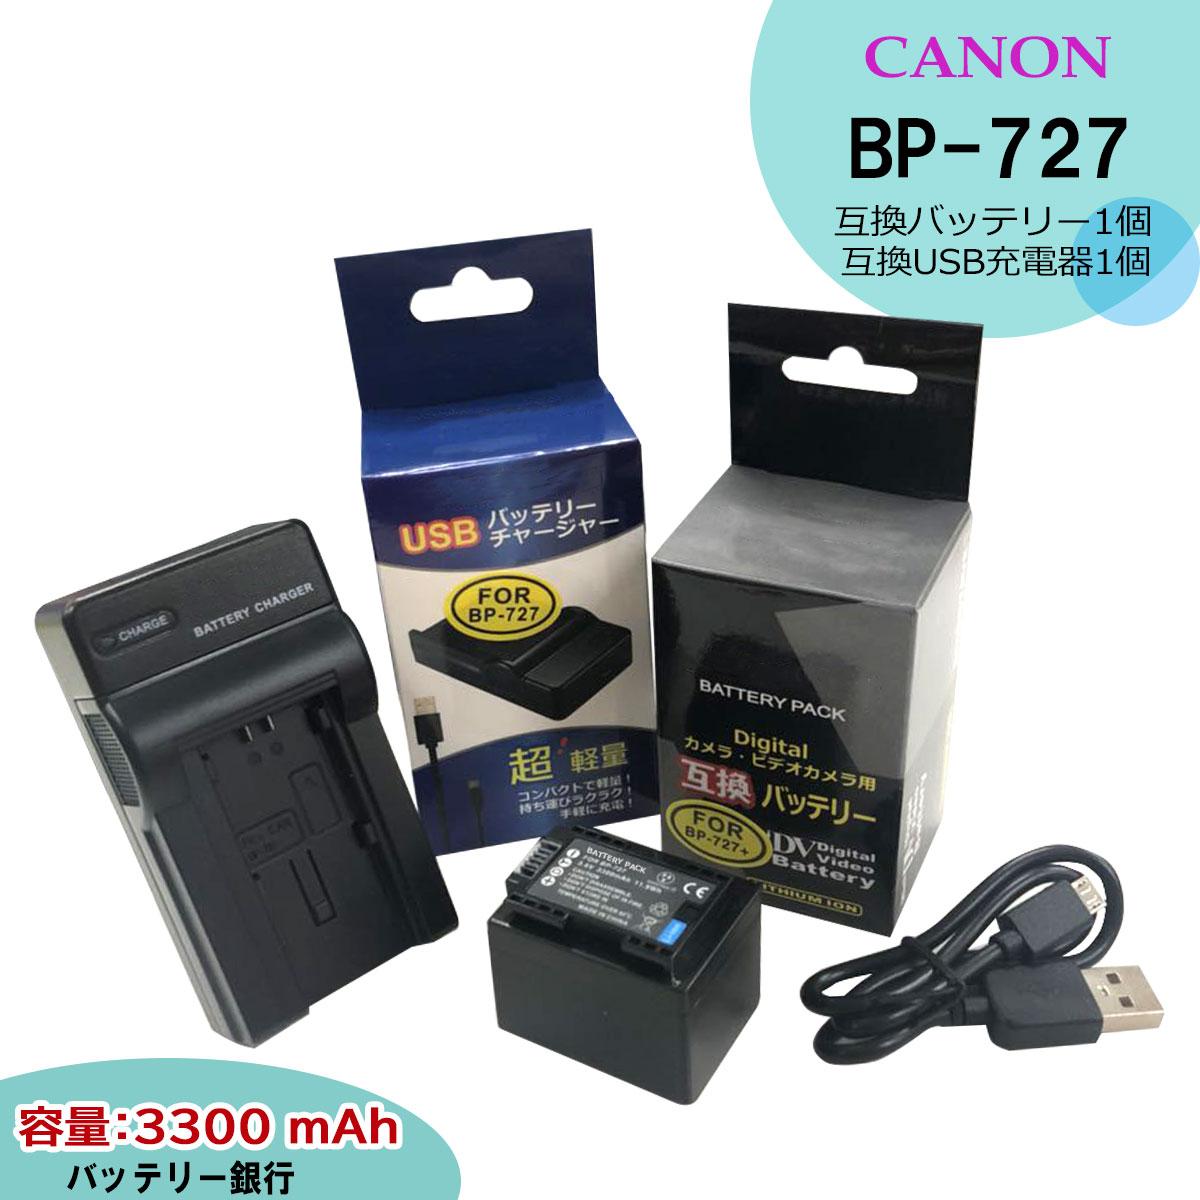 CANON BP-727 互換バッテリー 1個 と互換USB充電器 の2点セット【6ヶ月保証】 (残量表示可能)iVIS HF M52 / iVIS HF M51 / iVIS